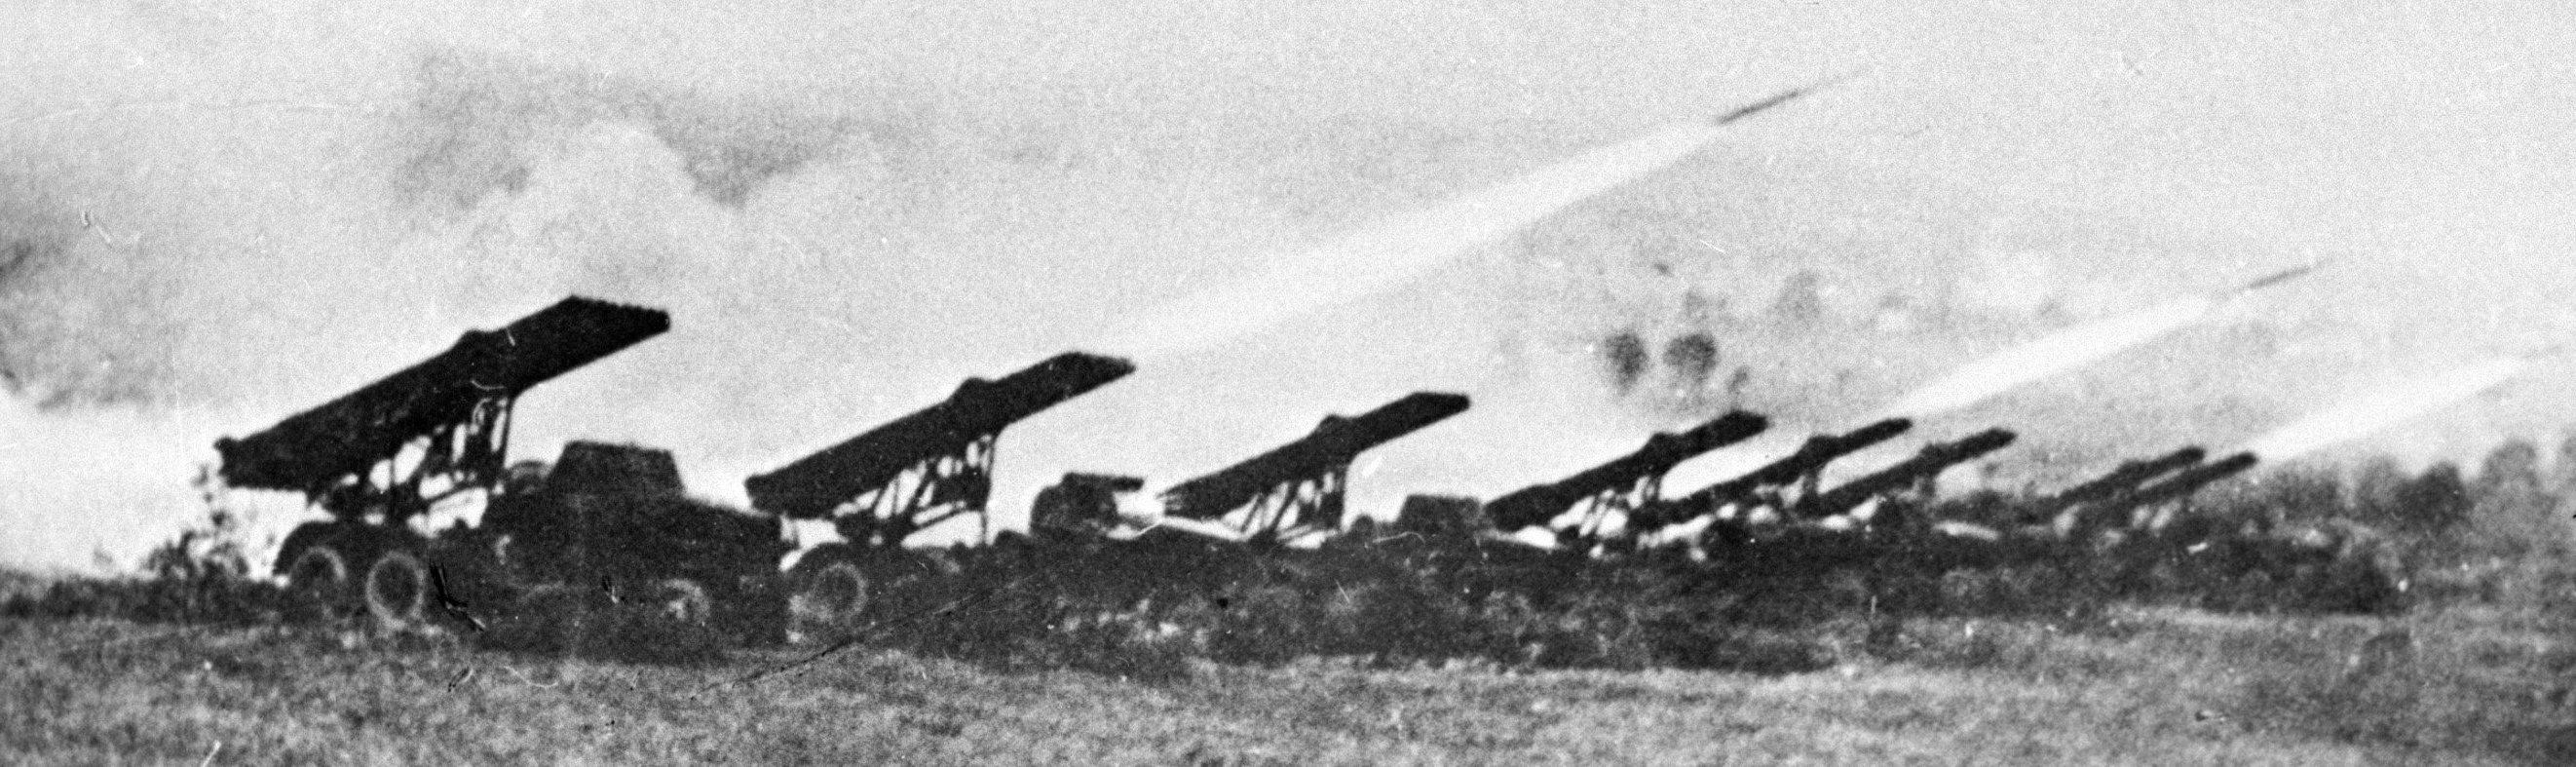 El sistema lanzamisiles soviético BM-13, la famosa Katiusha